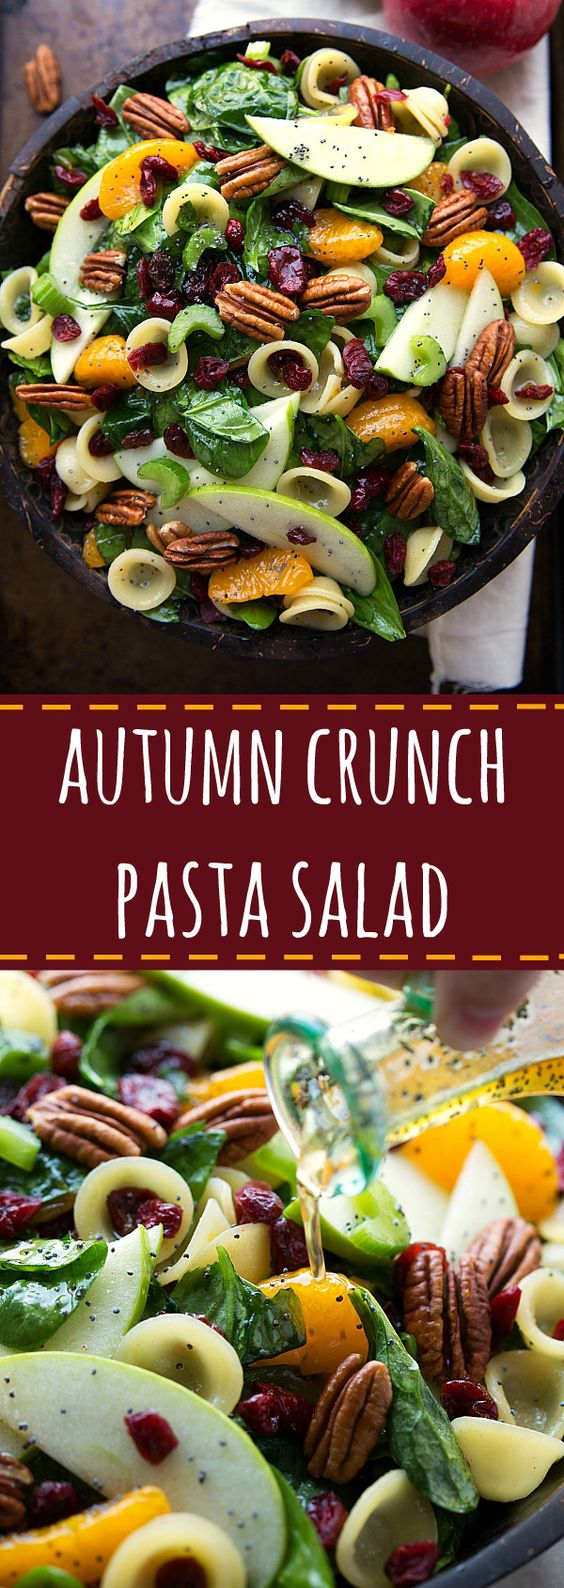 Delicious spinach pasta salad with cranberries, pecans, apple, and mandarin orange: